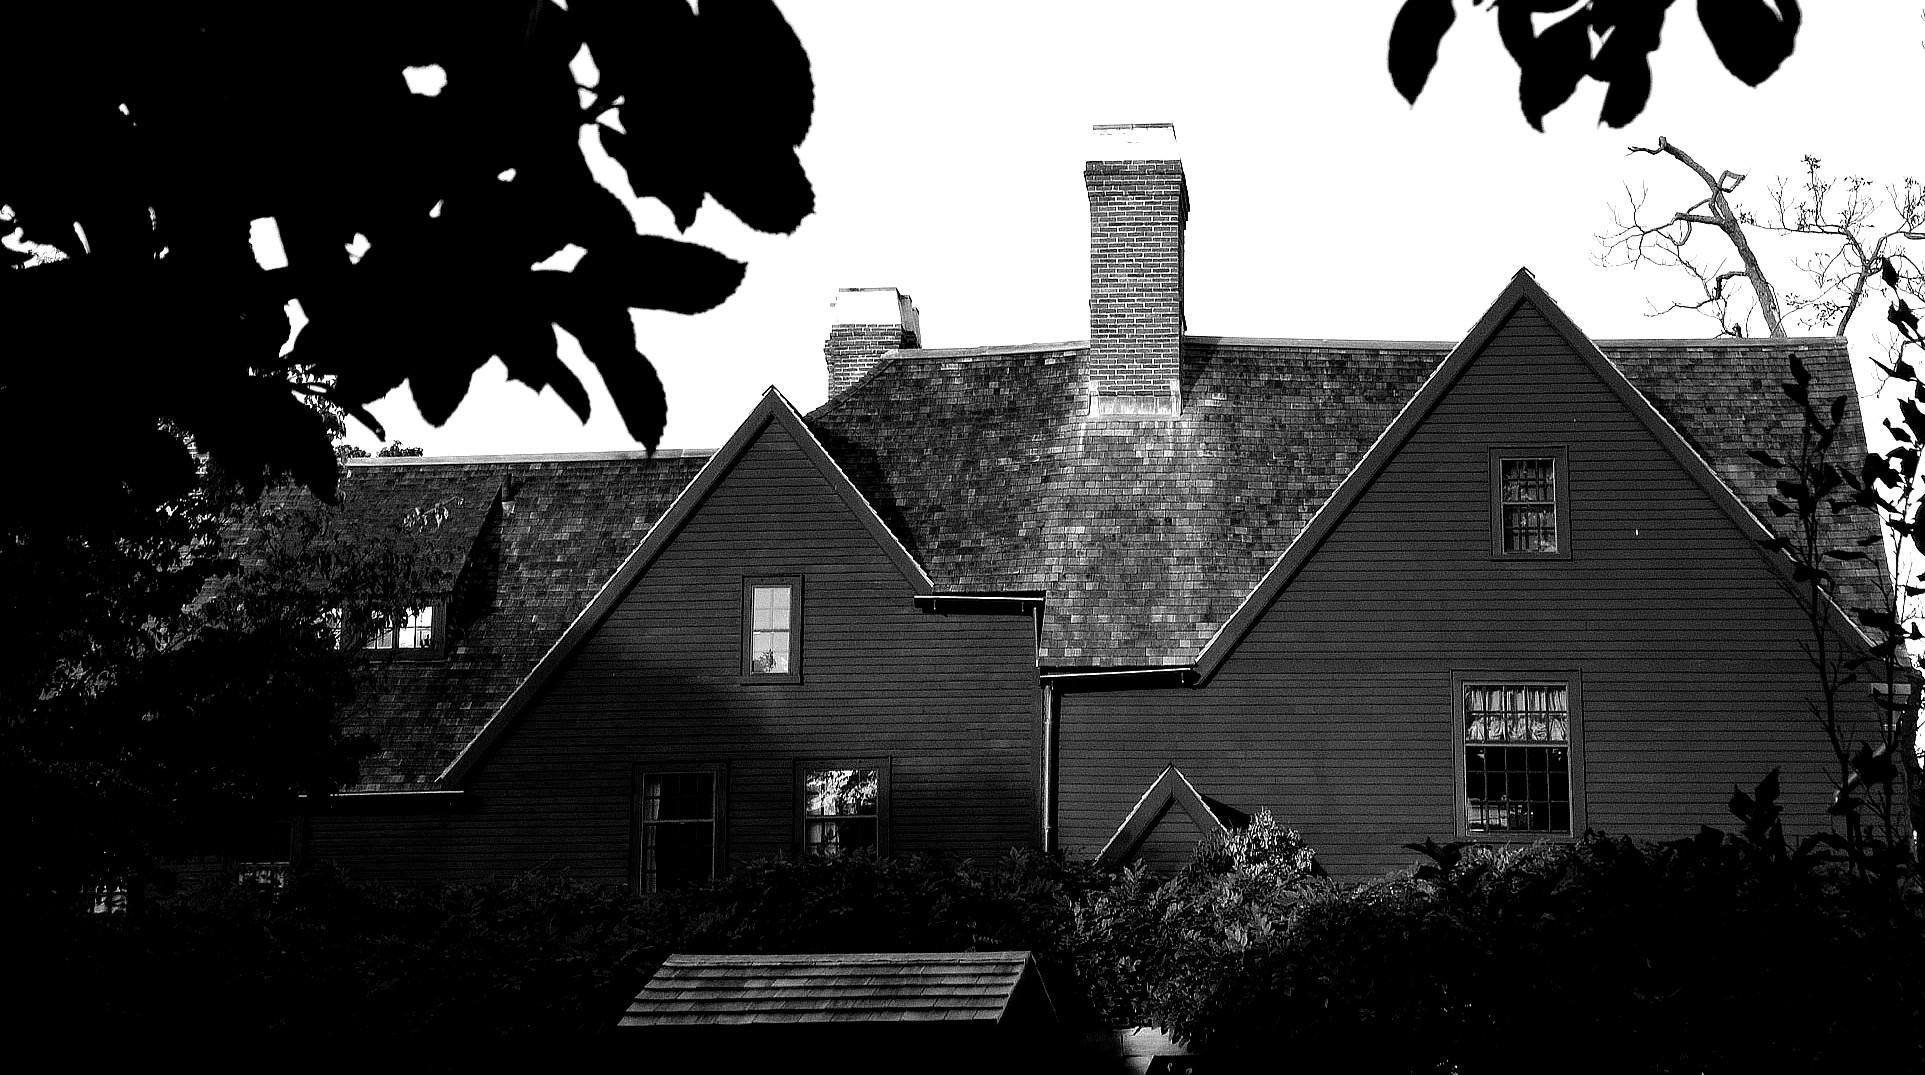 House of the Seven Gables, Salem, MA.